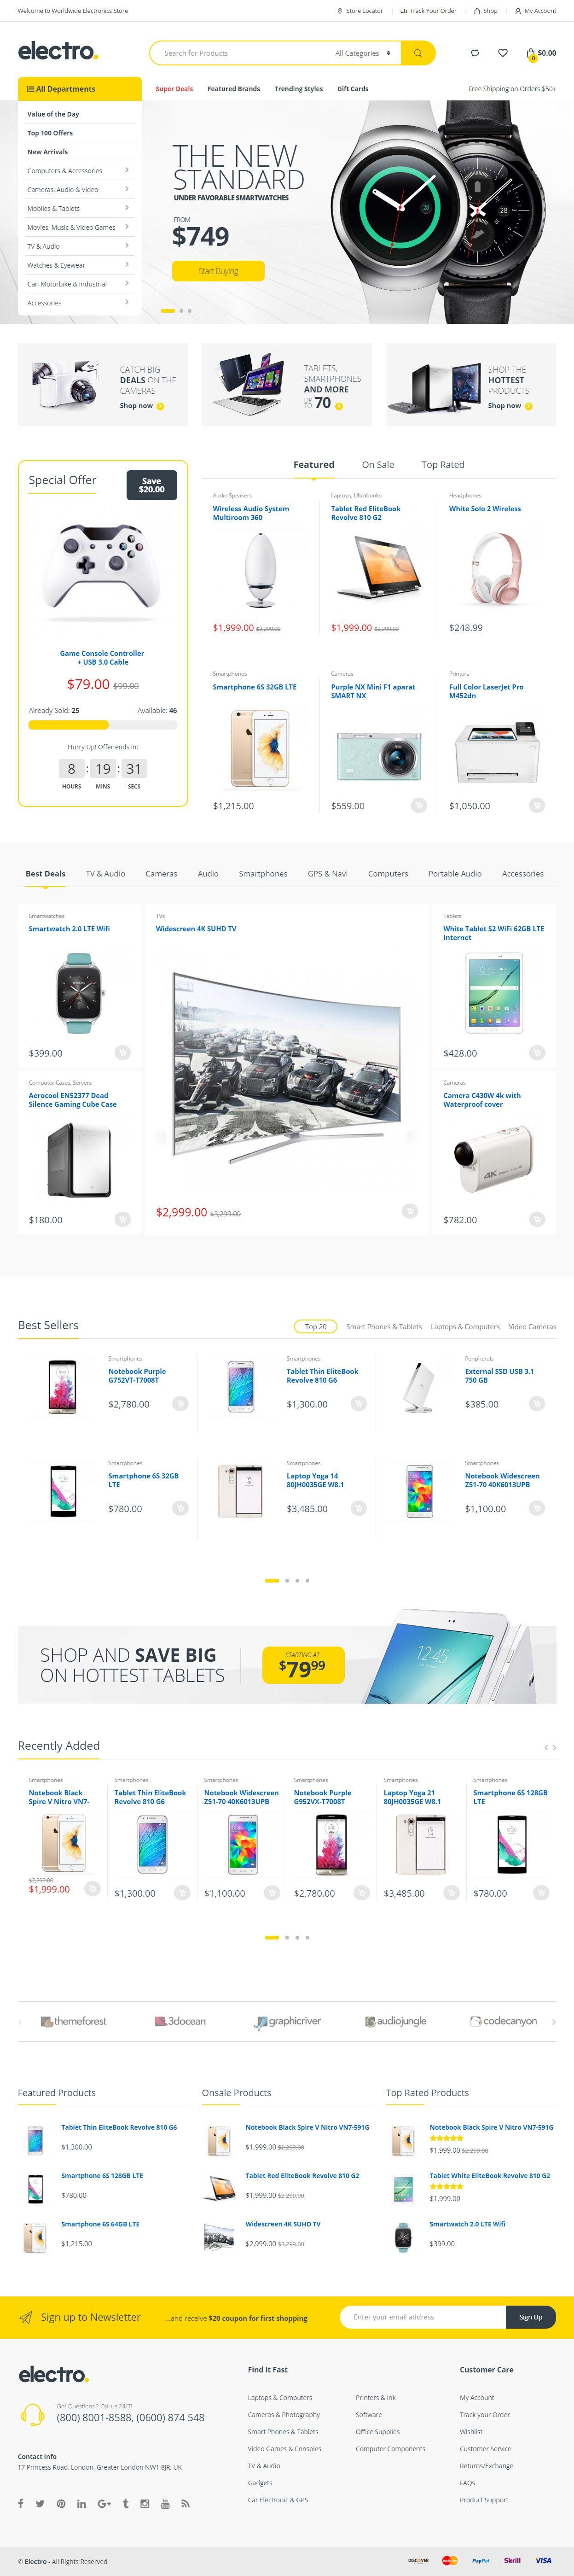 Electro is Premium full Responsive Retina WordPress Theme